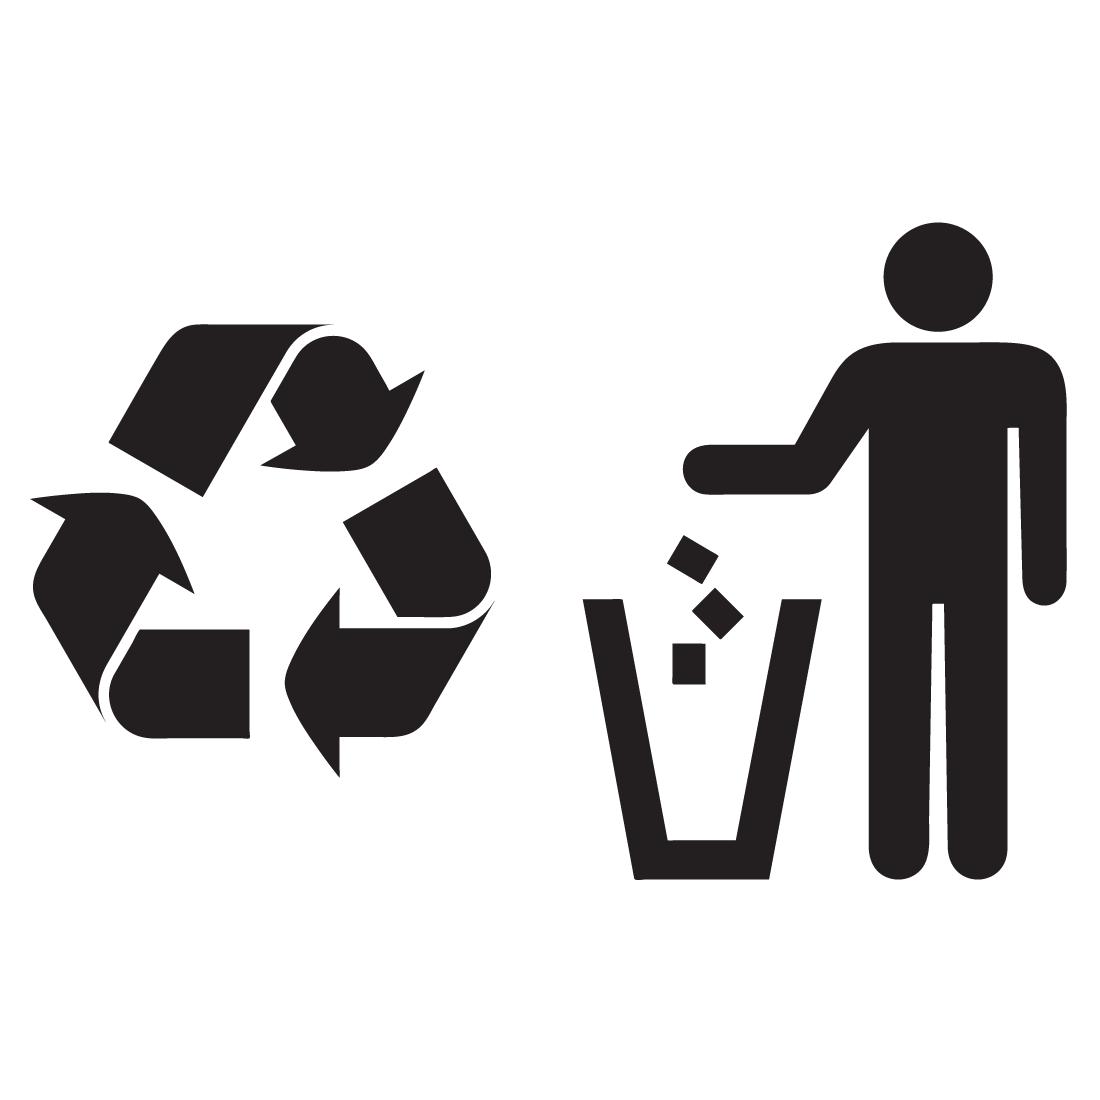 Papelera de reciclaje clipart jpg free stock Adhesivo de vinilo Basura, Papelera y Reciclaje | vinilos | Simbolo ... jpg free stock